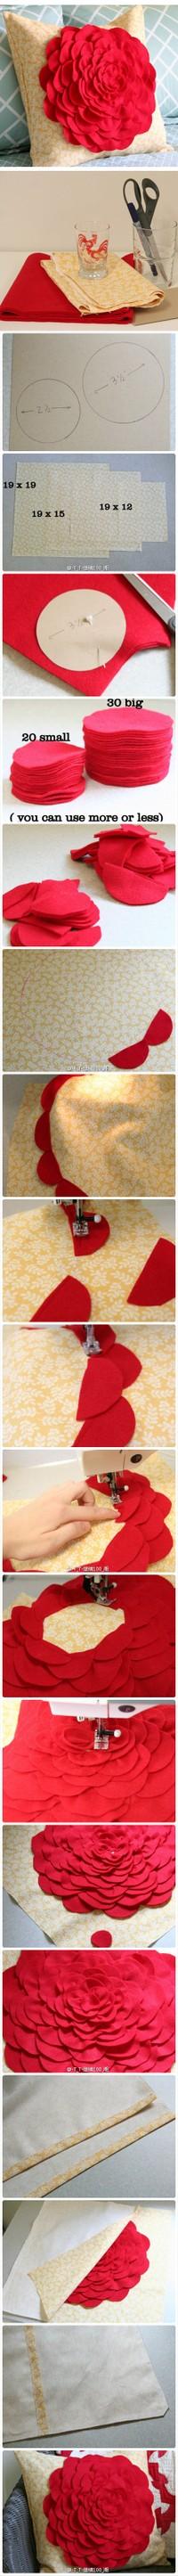 3 dementential flower pillows with tutorial